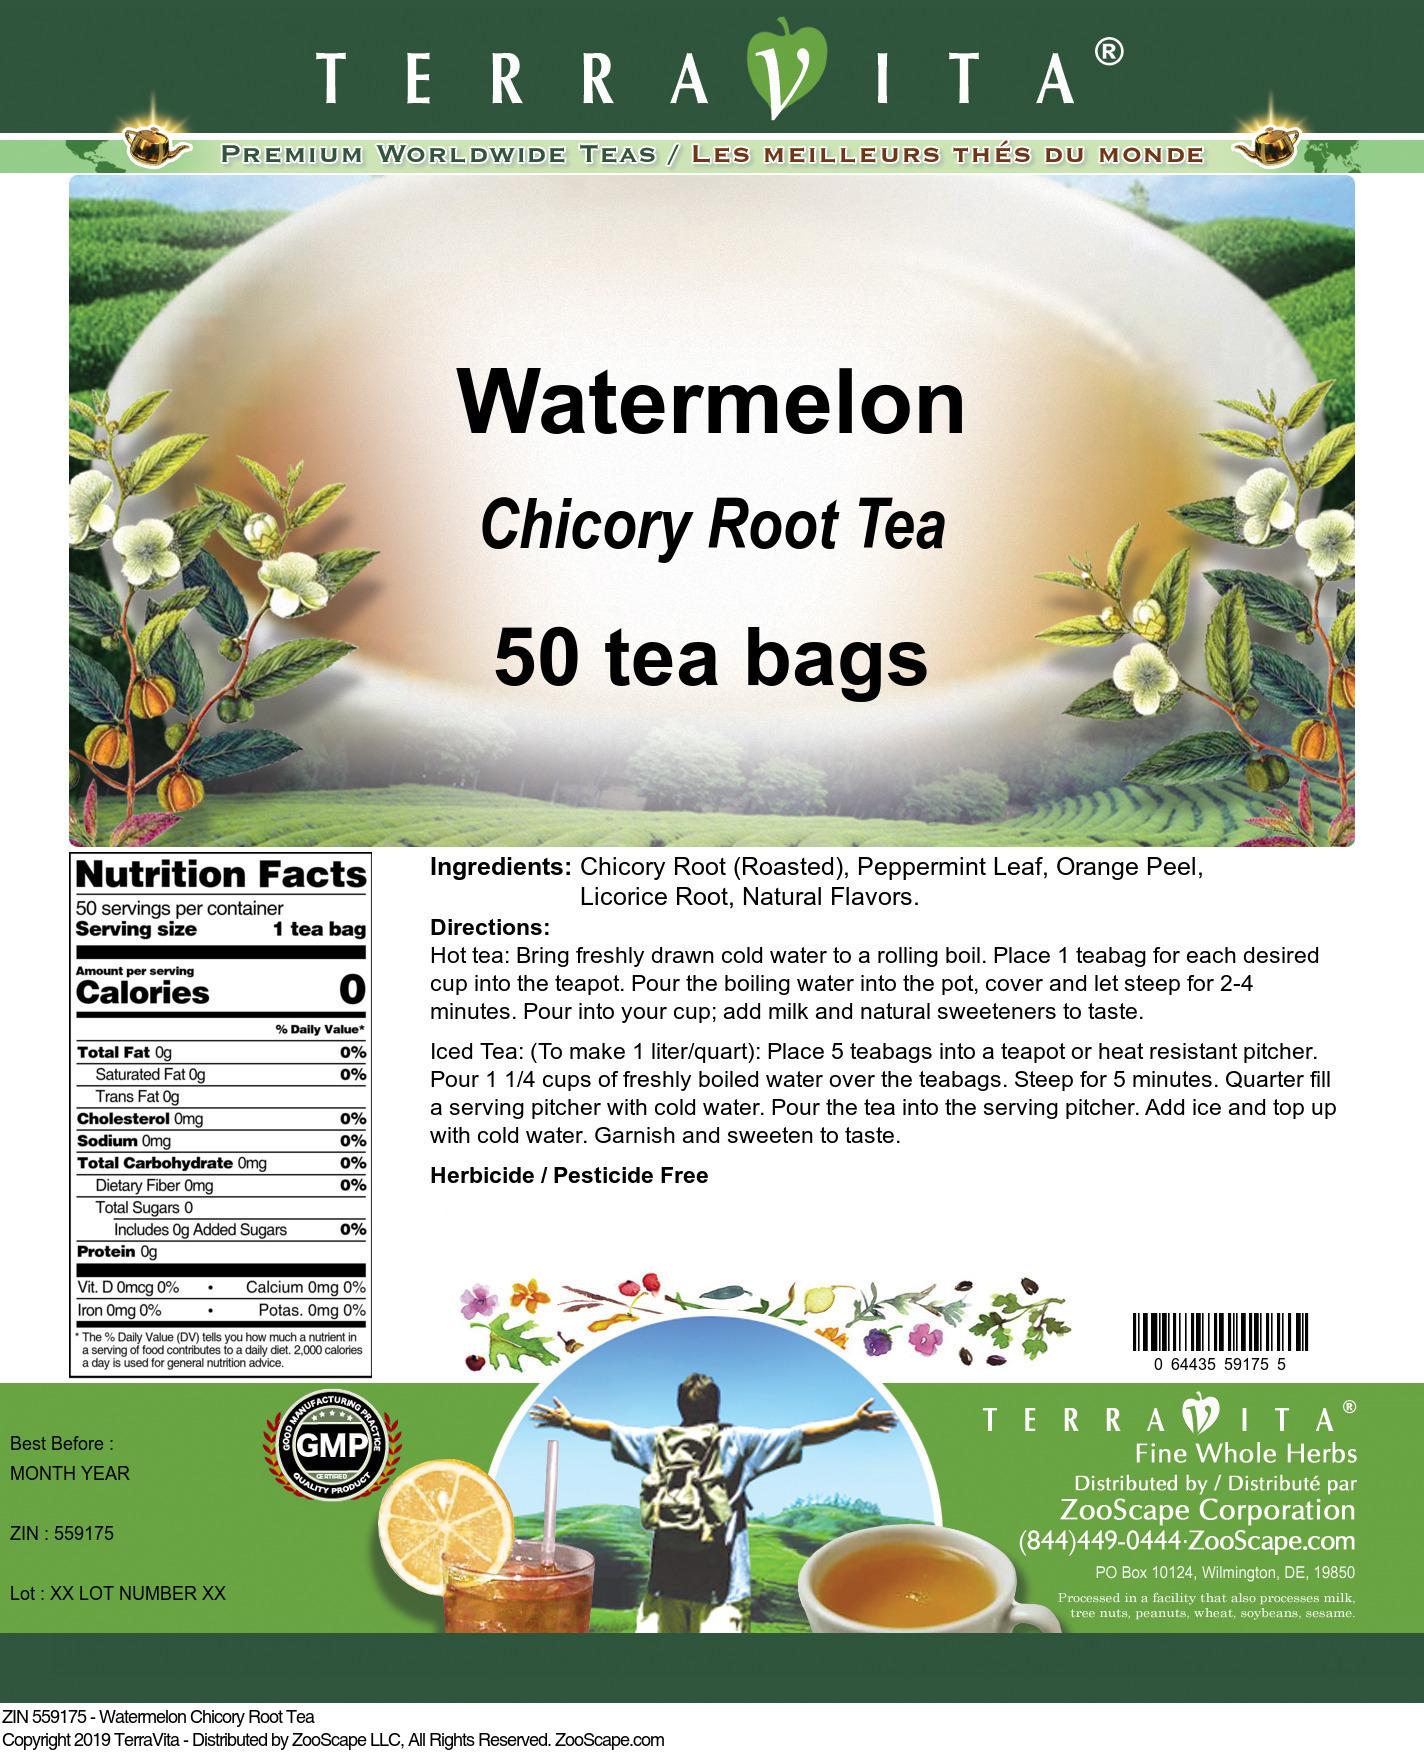 Watermelon Chicory Root Tea